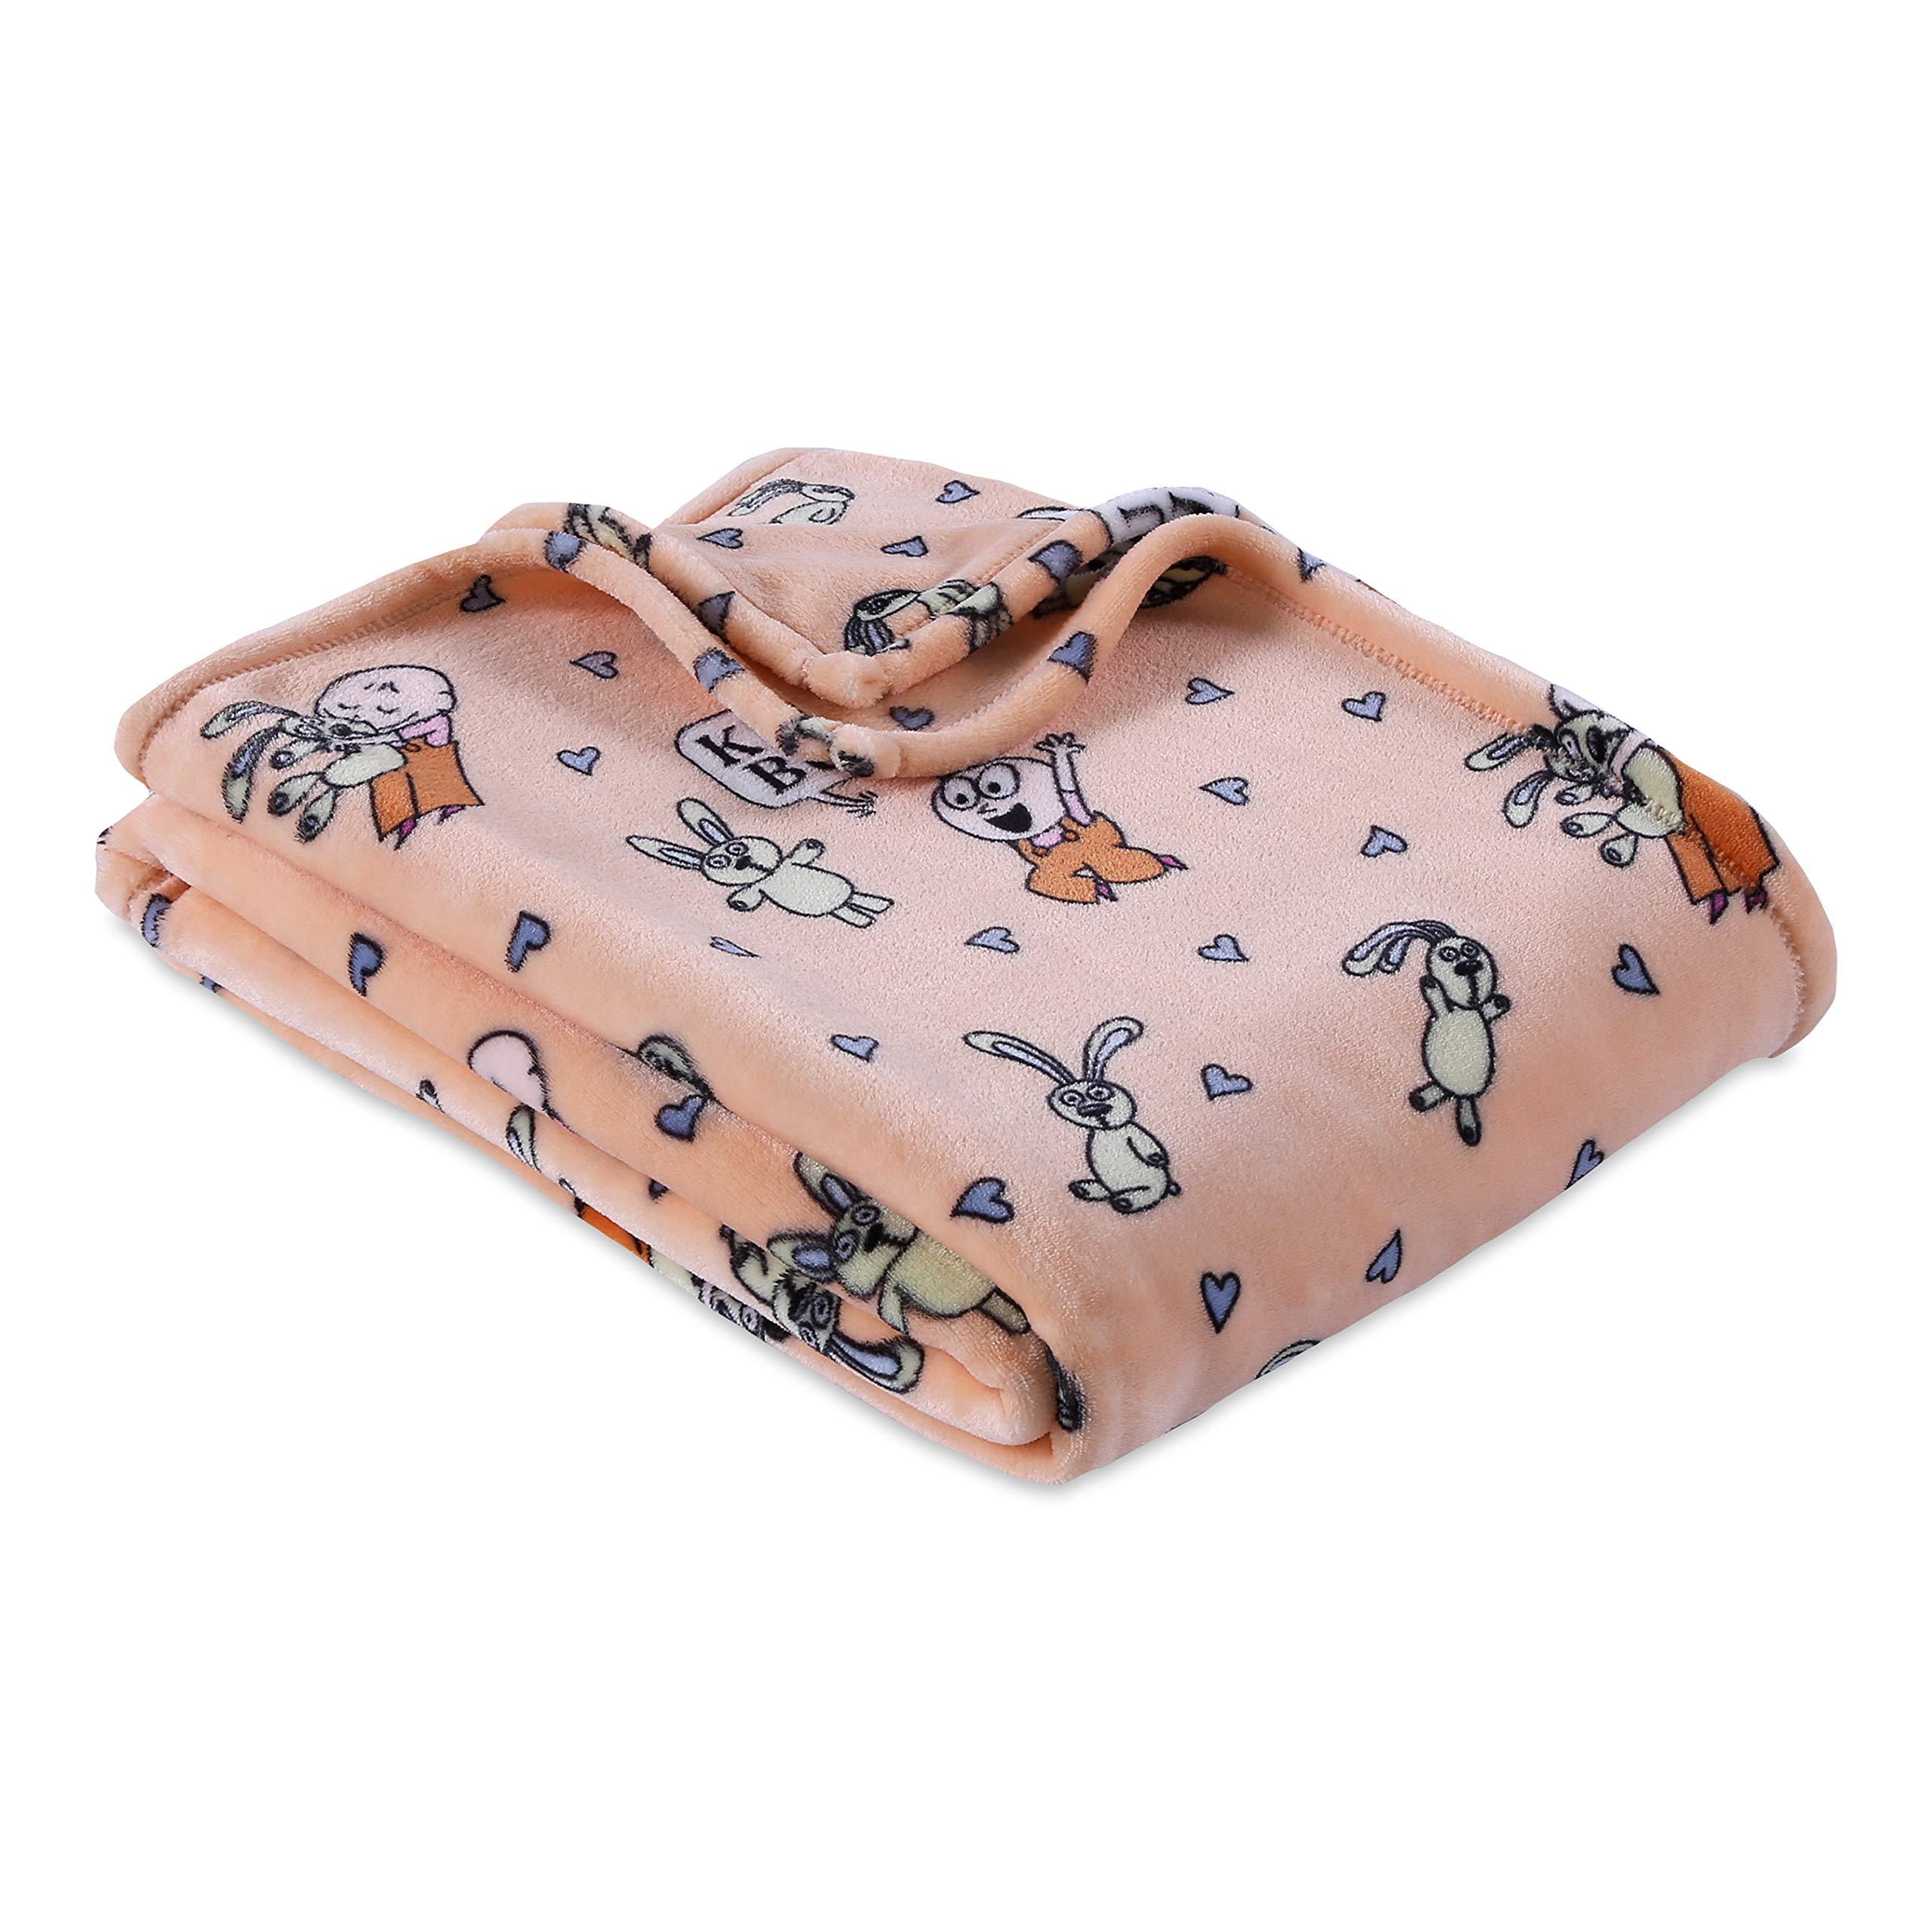 "Berkshire Blanket Mo Willems VelvetLoft Soft Cozy Plush Throw, Knuffle Bunny: A Cautionary Tale, 50"" x 70"""